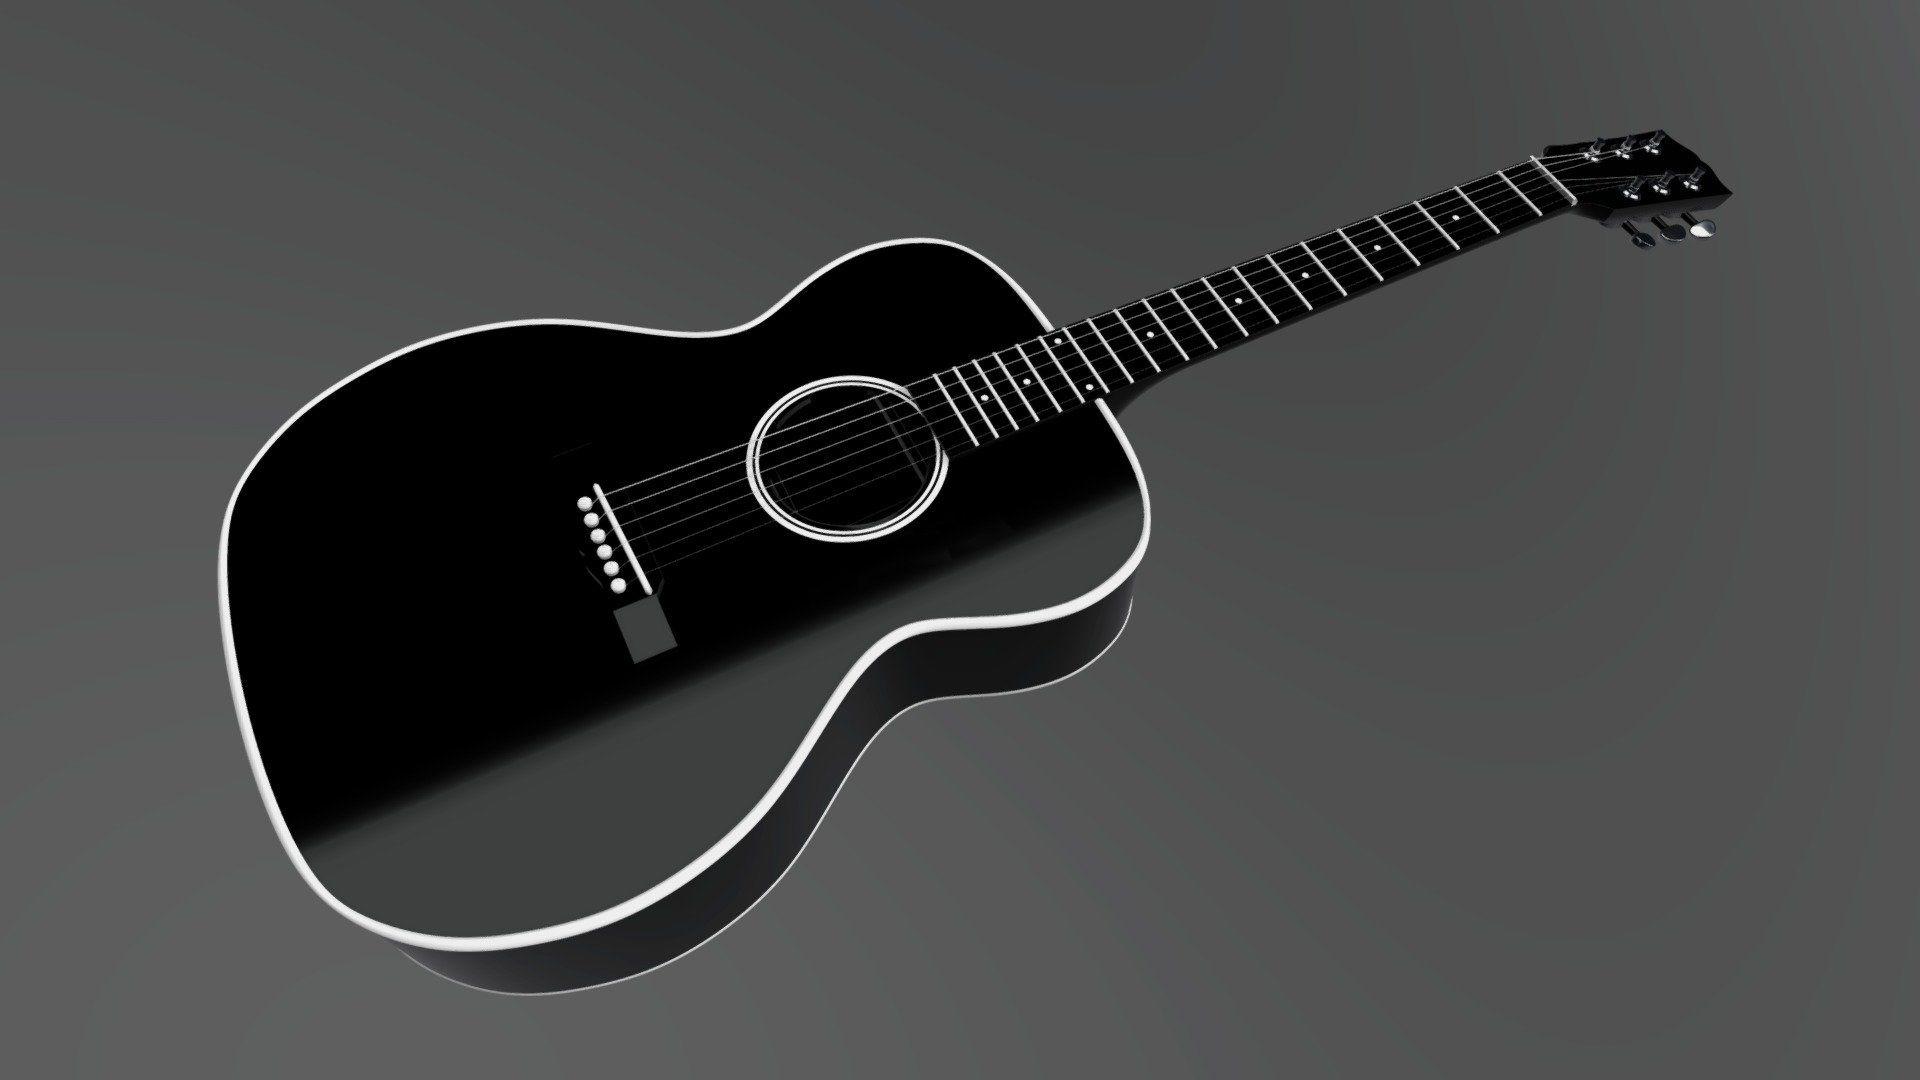 Acoustic Guitar Black, Computer Wallpaper